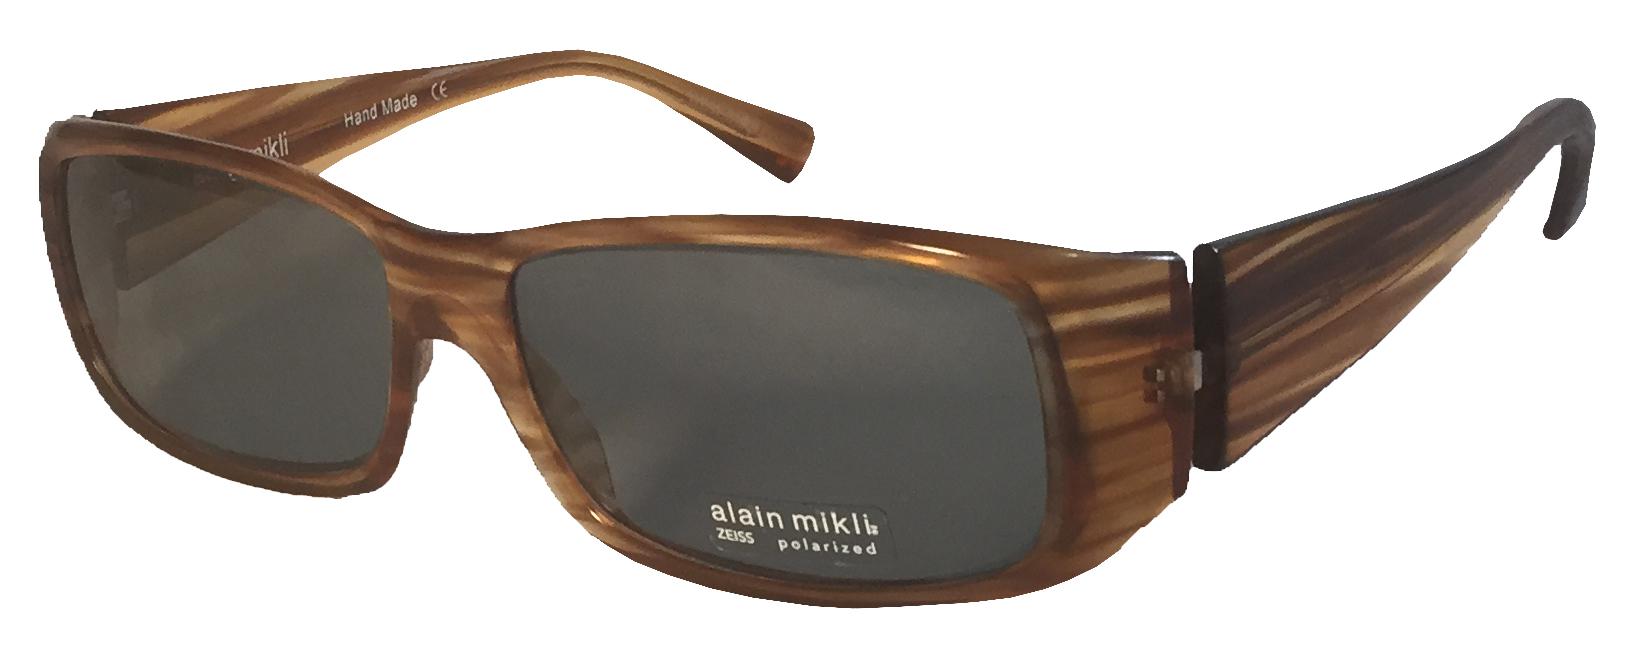 CLEARANCE ALAIN MIKLI A0486 13V2